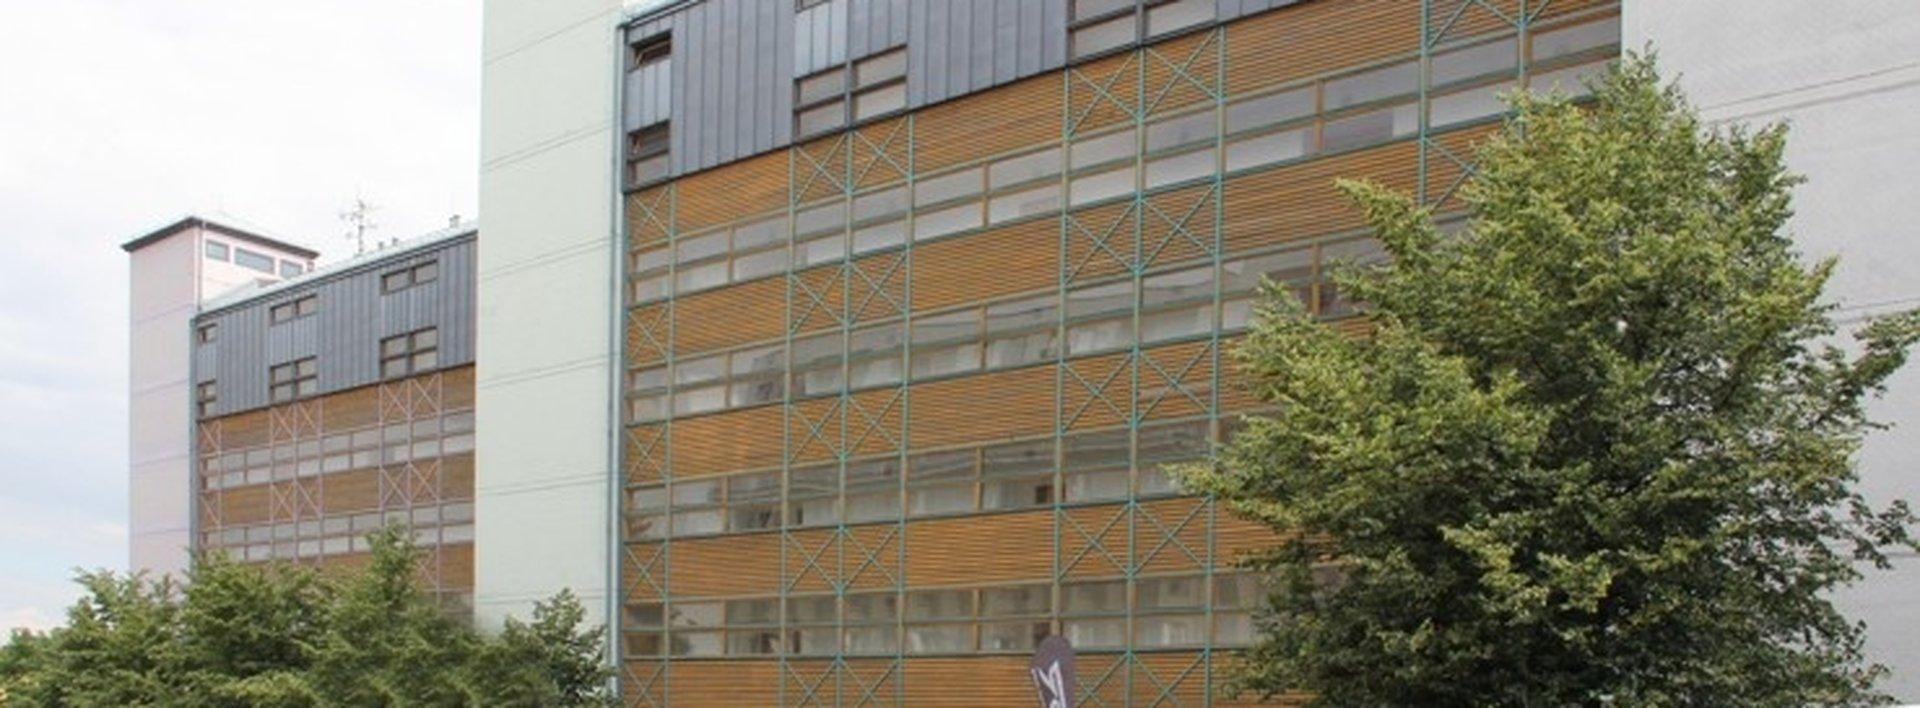 Prodej slunného bytu 1+kk s balkonem, 35 m², Ev.č.: N48511